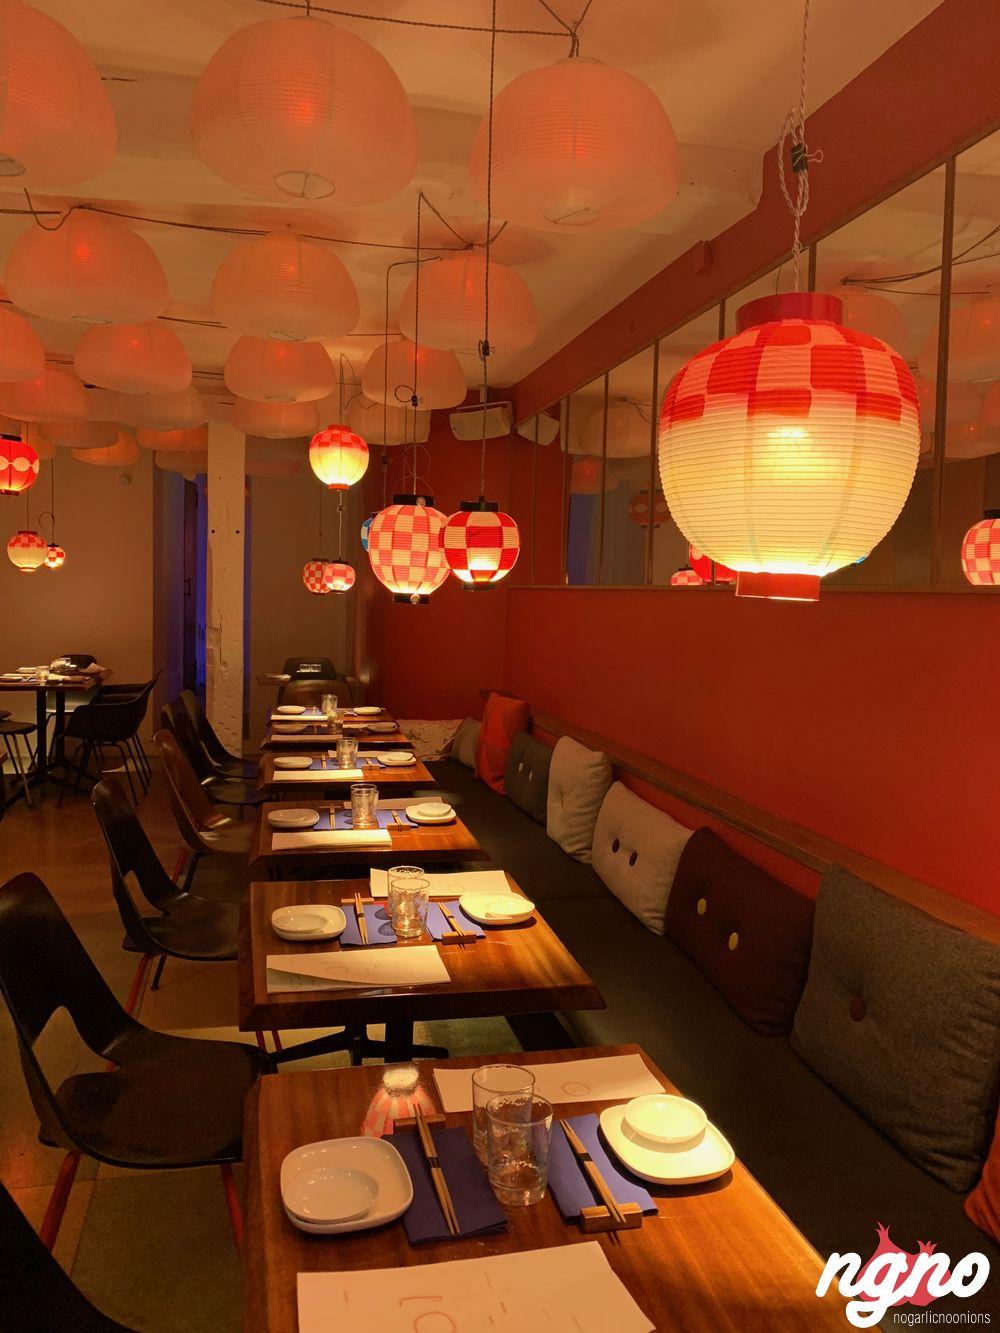 blueberry-maki-sushi-paris-nogarlicnoonions-752018-10-13-05-58-58